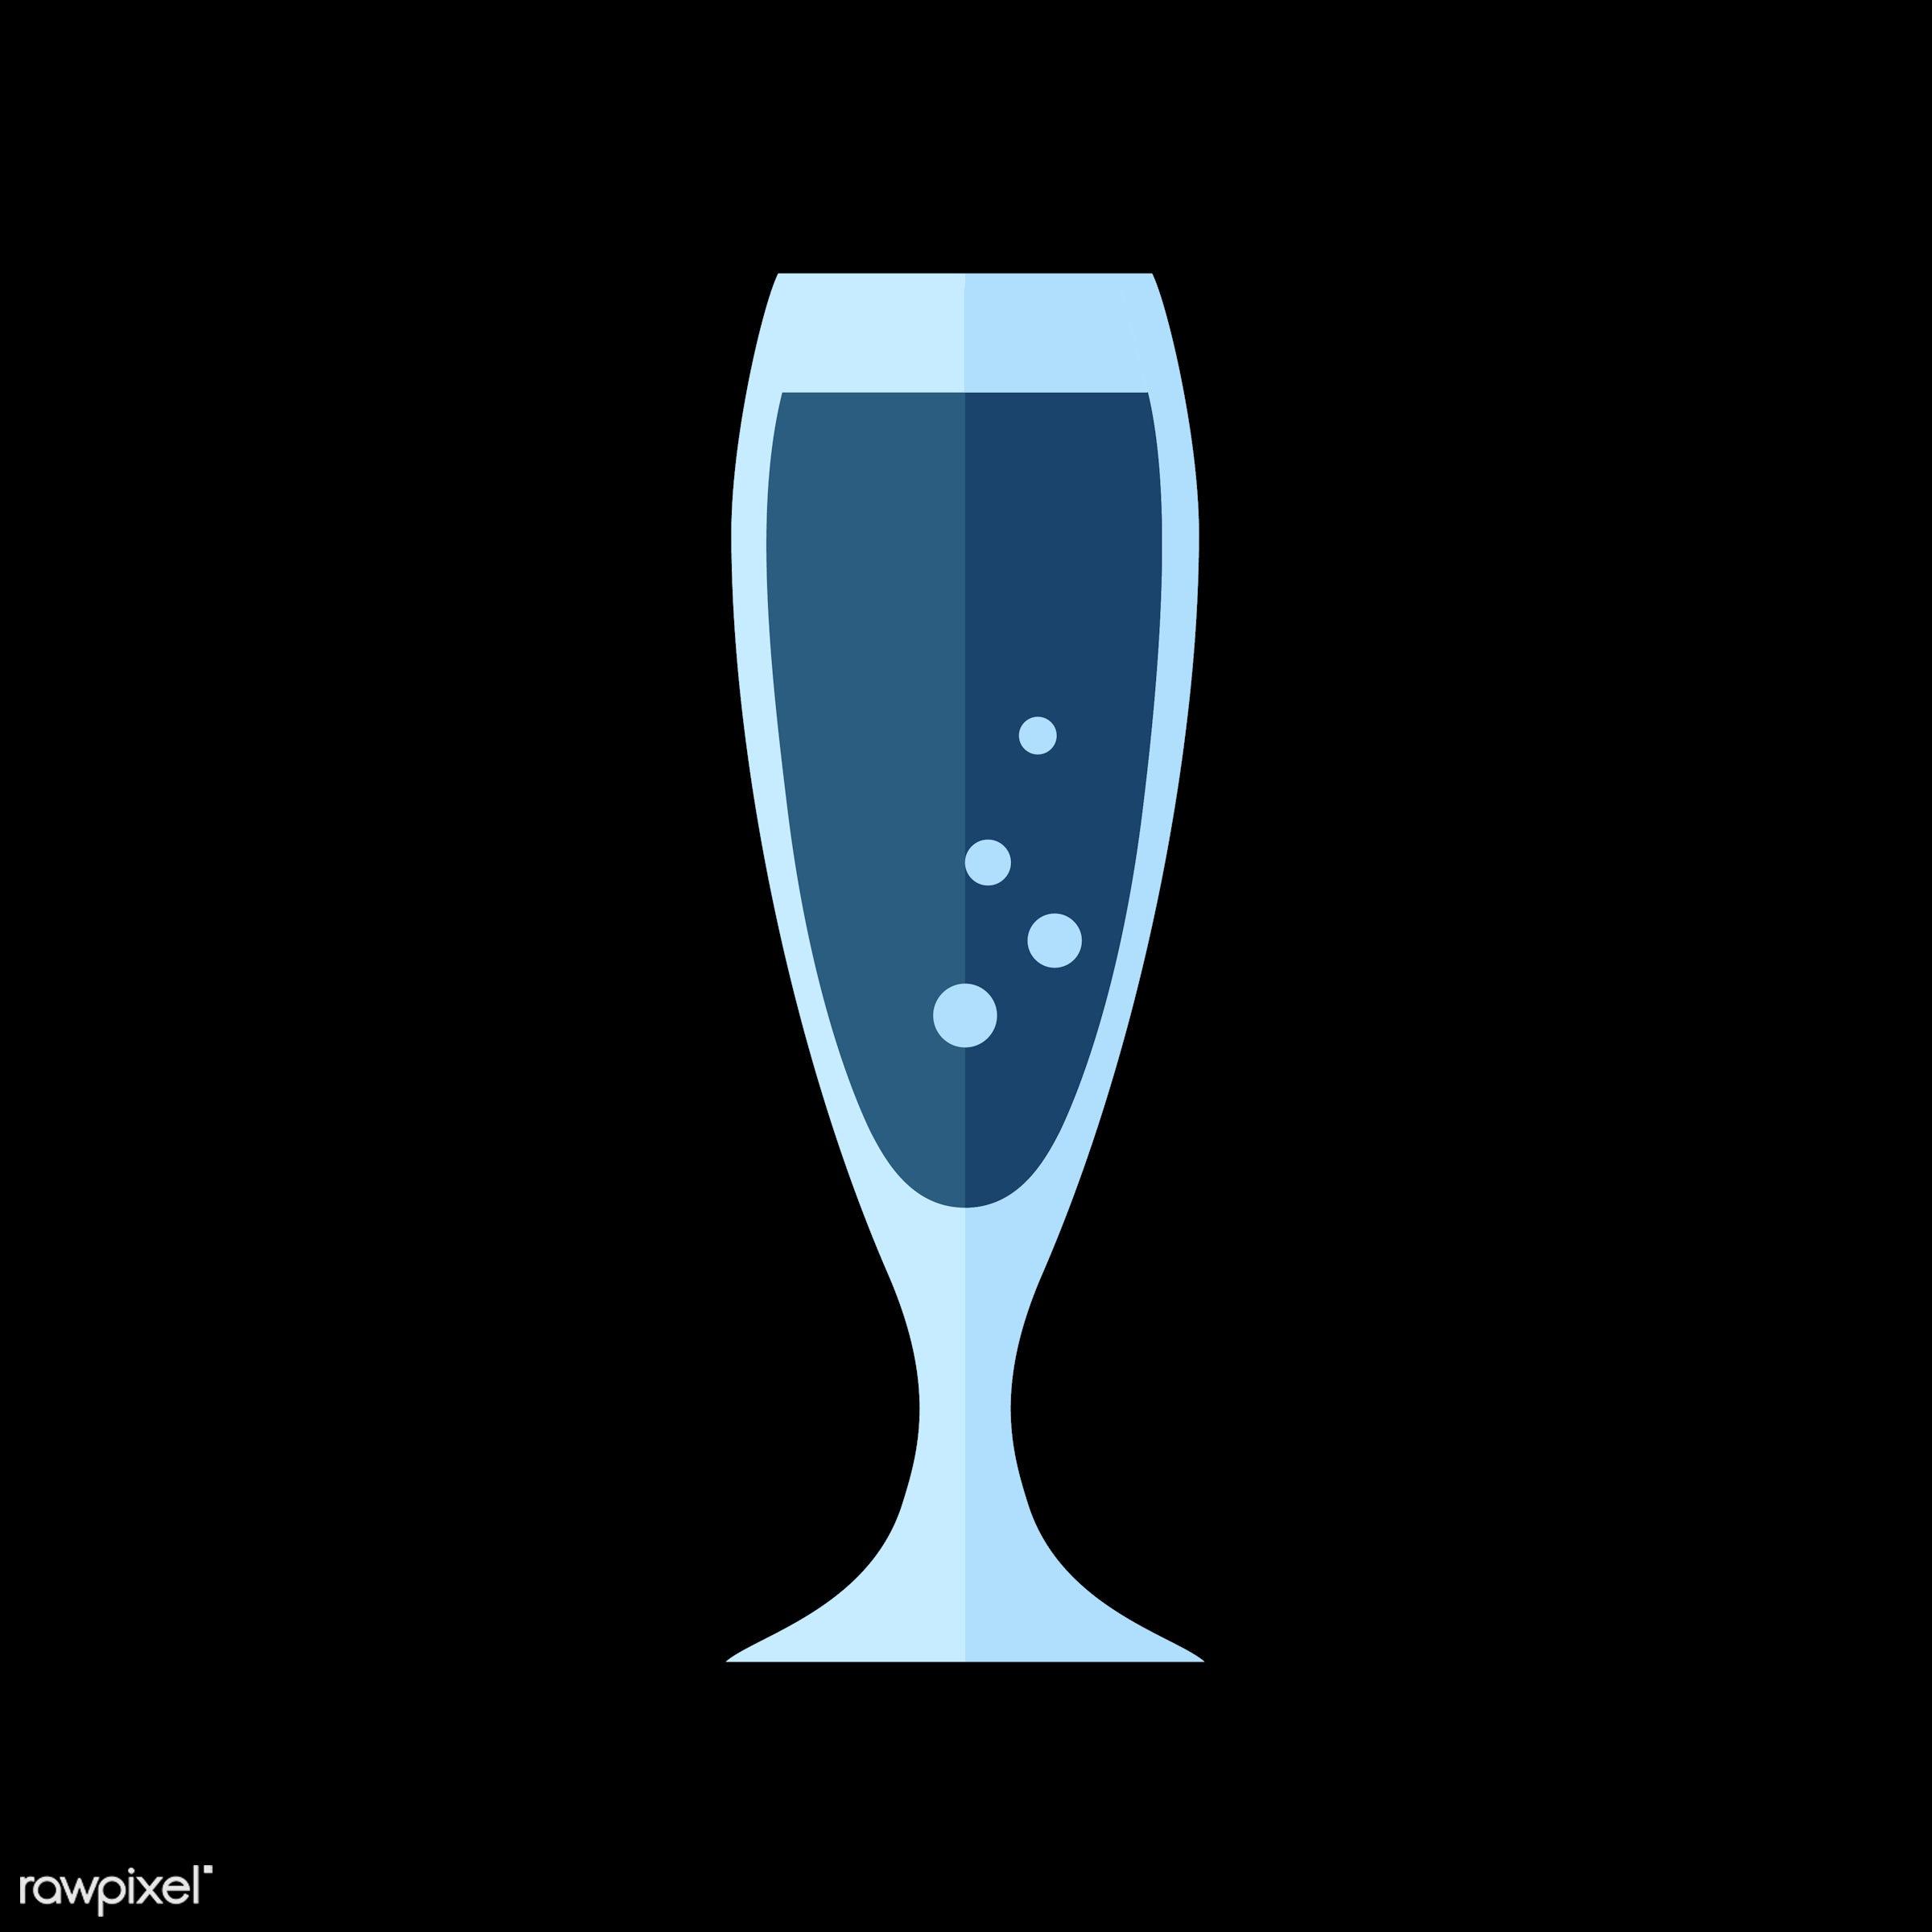 Sparkling wine vector - vector, graphic, illustration, icon, symbol, colorful, cute, drink, water, beverage, soda, sparkling...